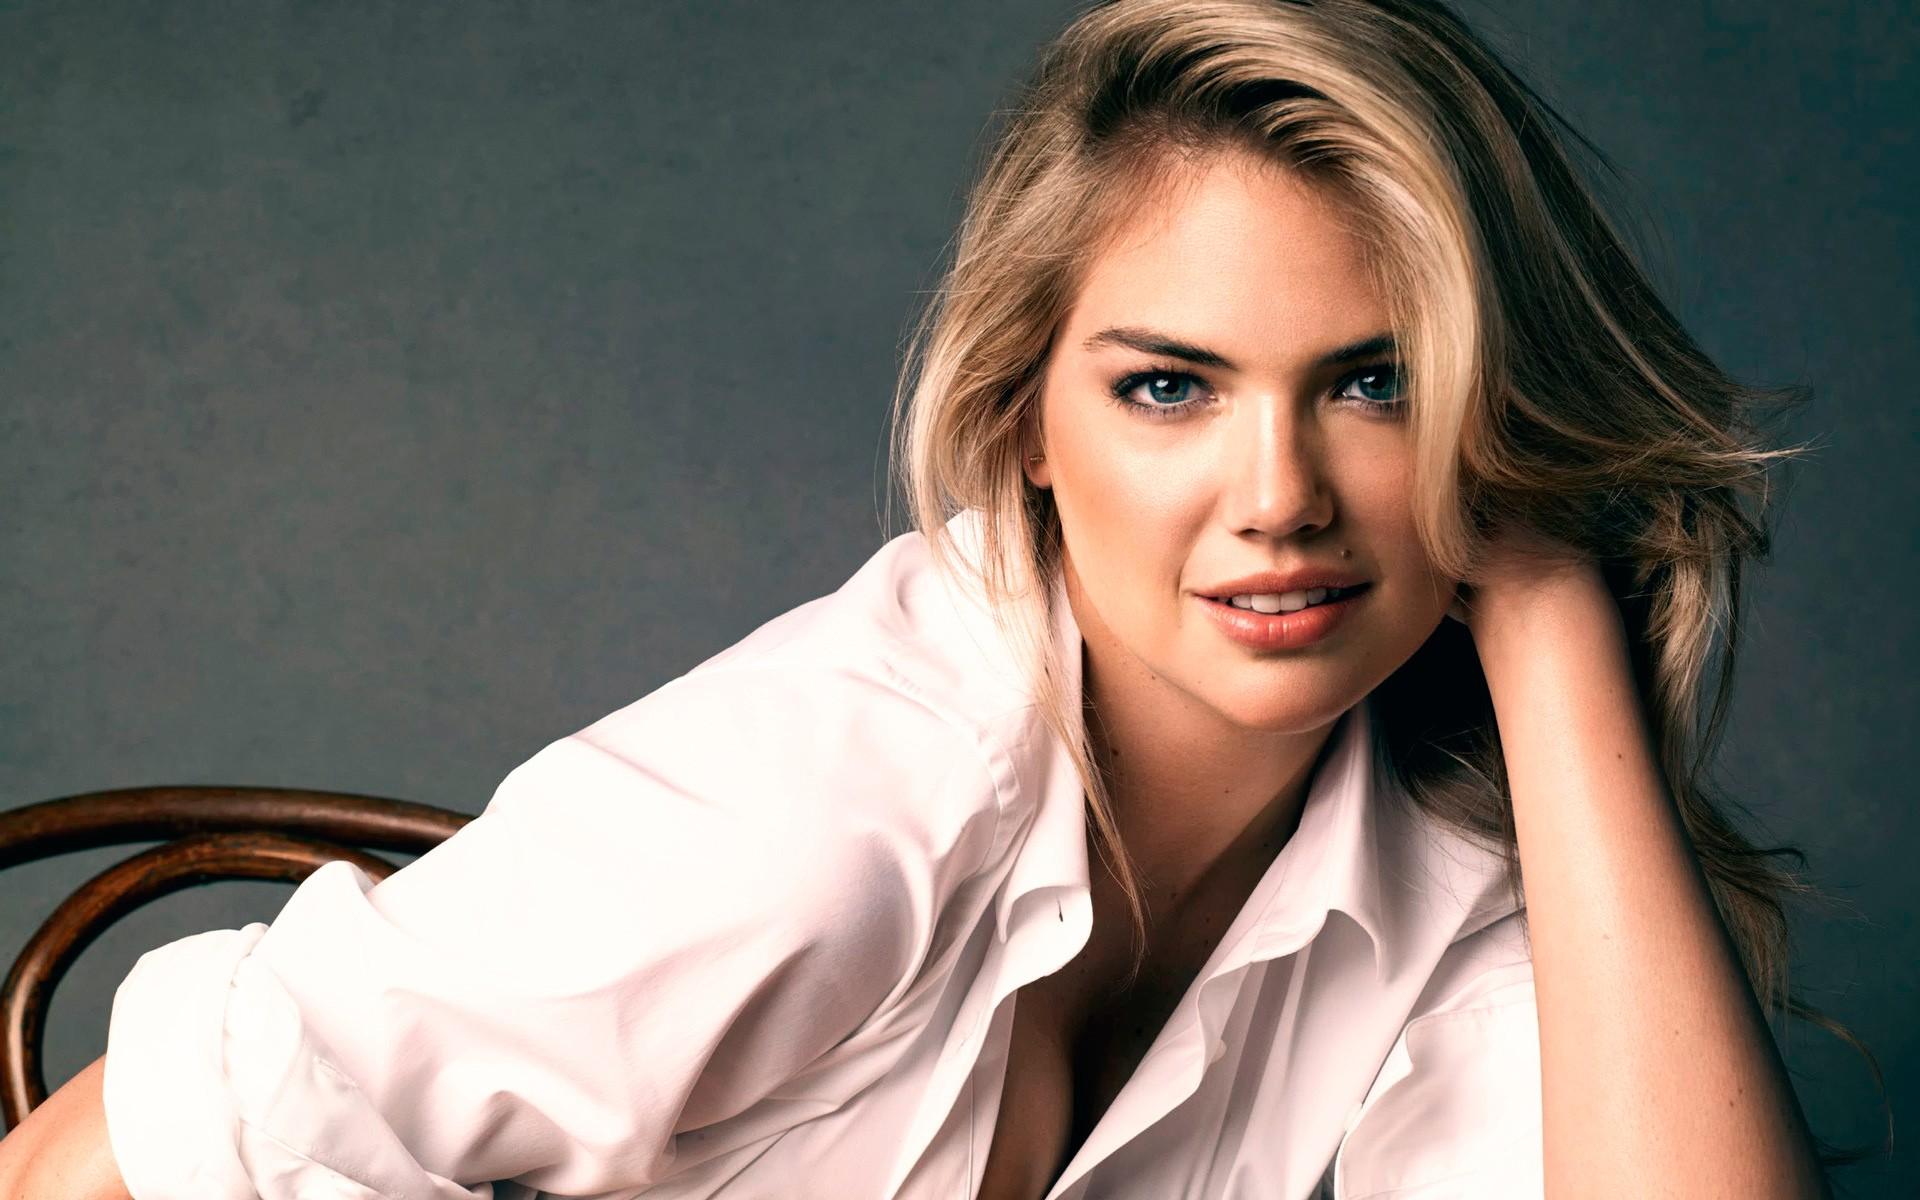 Kate upton hd celebrities 4k wallpapers images - 4k kate upton ...